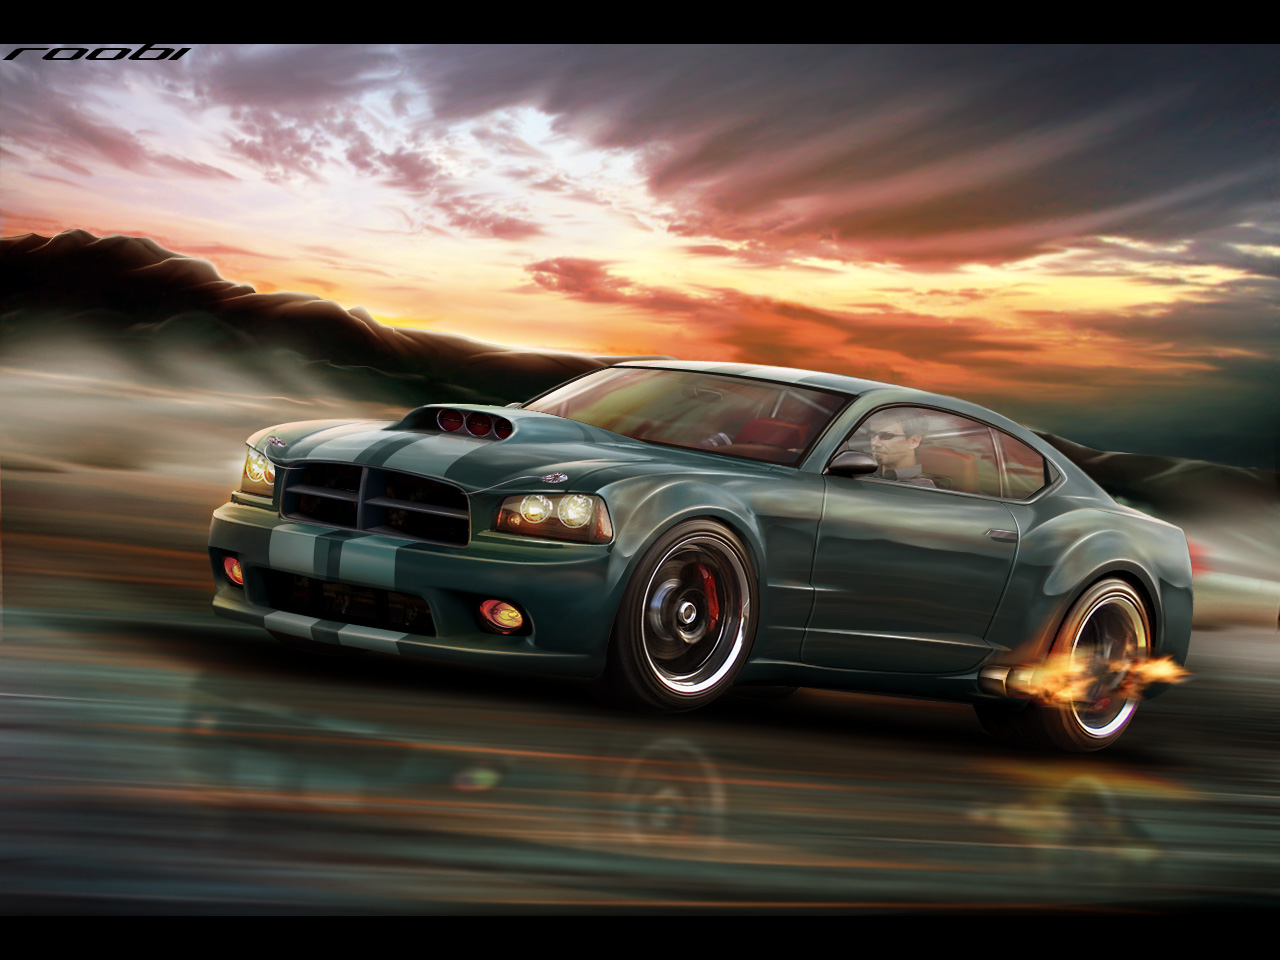 Wallpaper s de carros side desktop - Muscle cars wallpaper hd pack ...